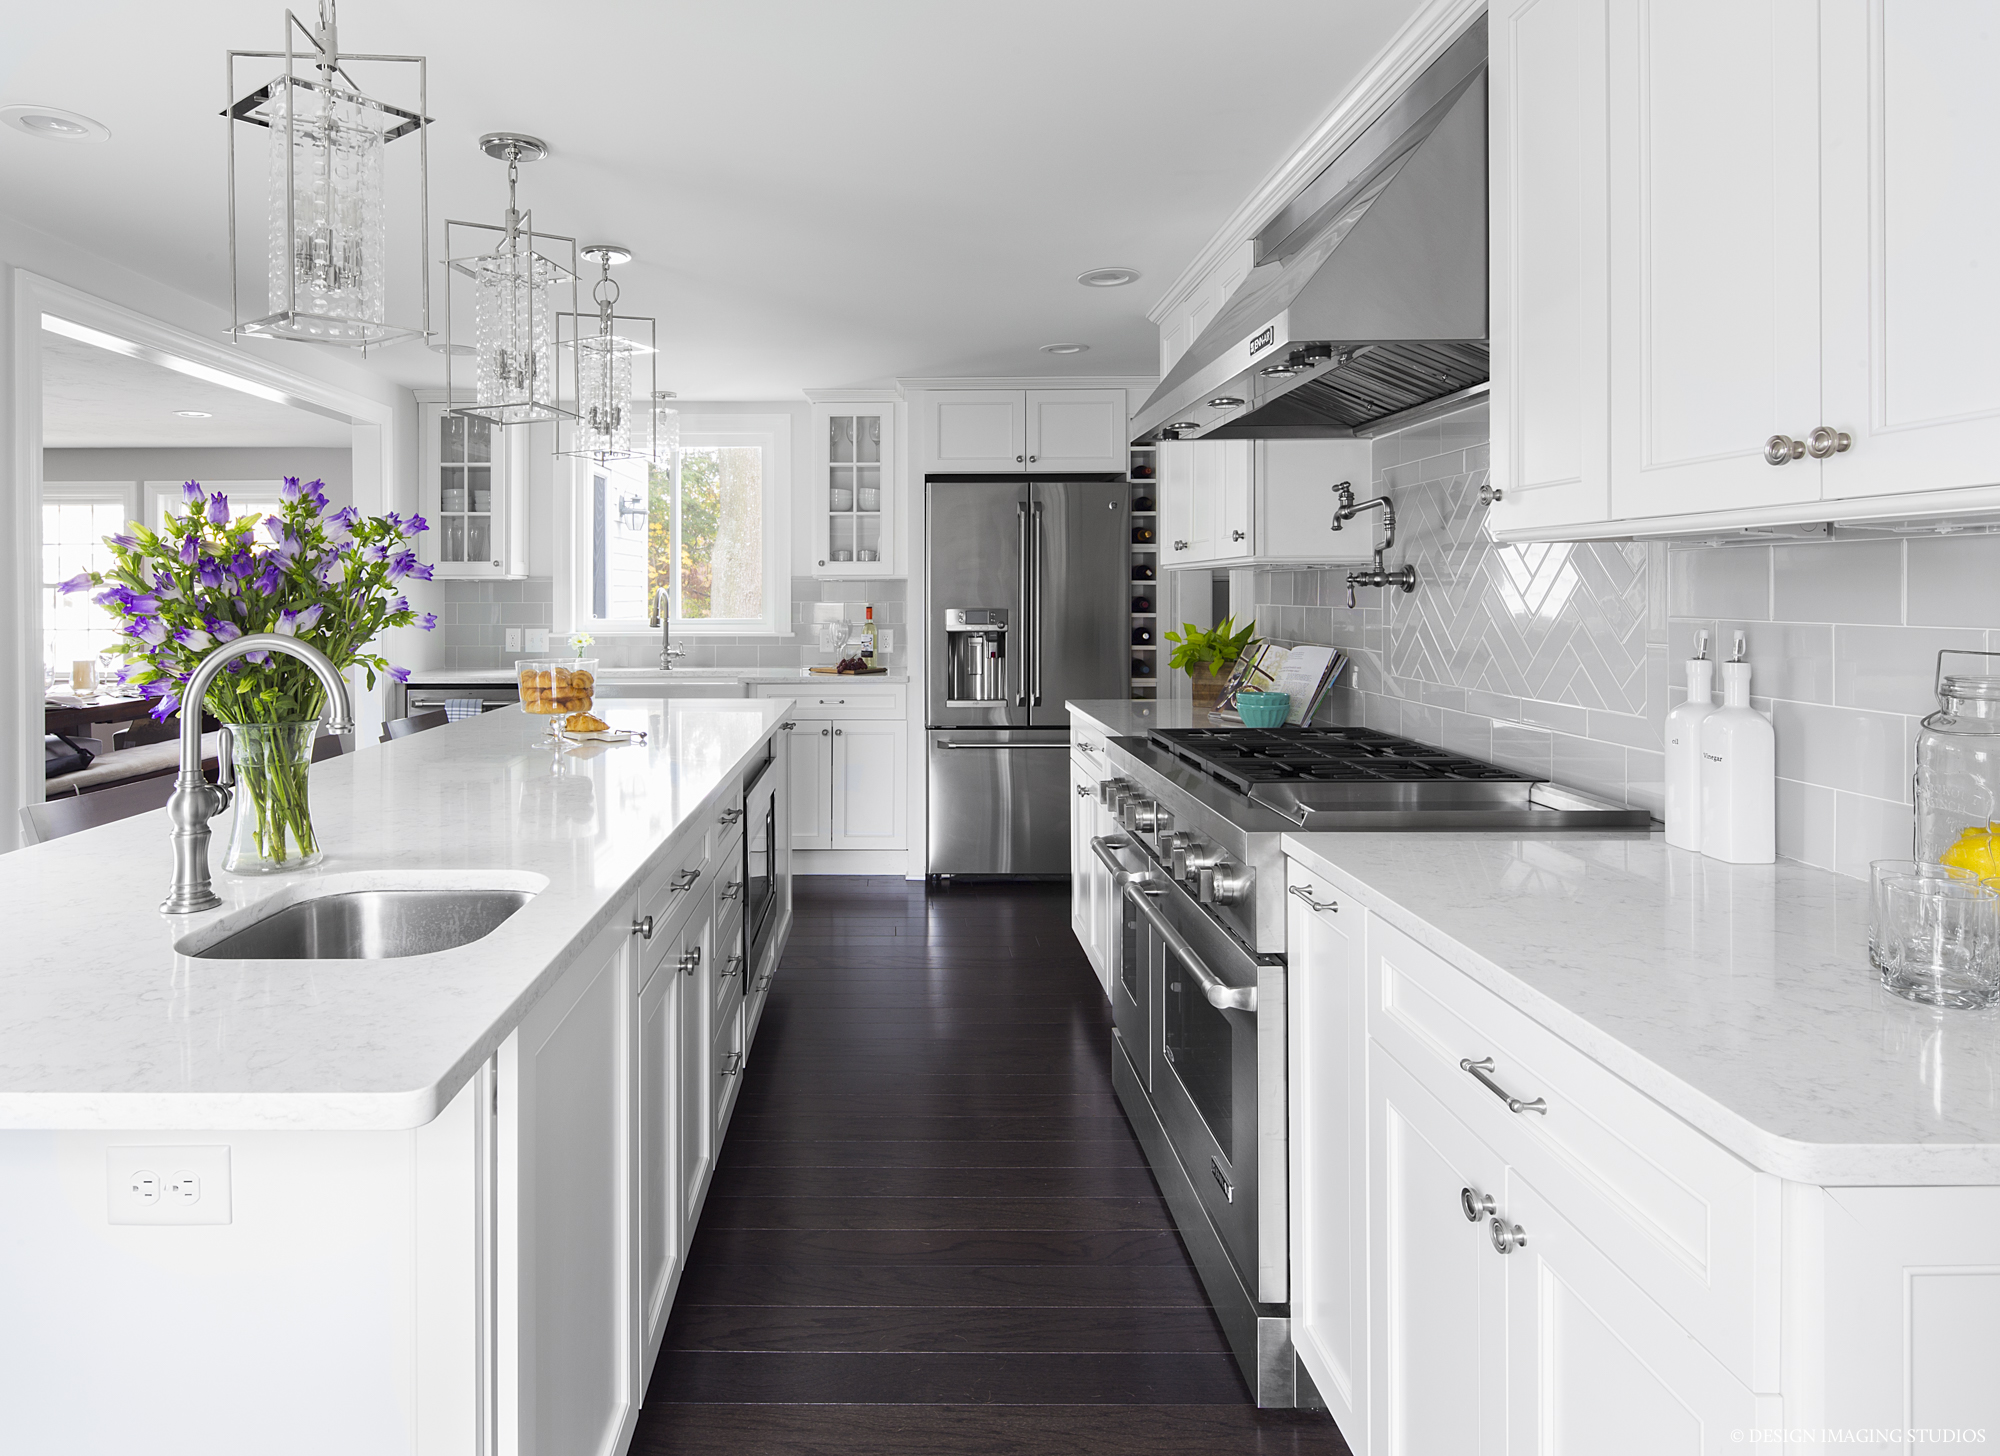 style a kitchen